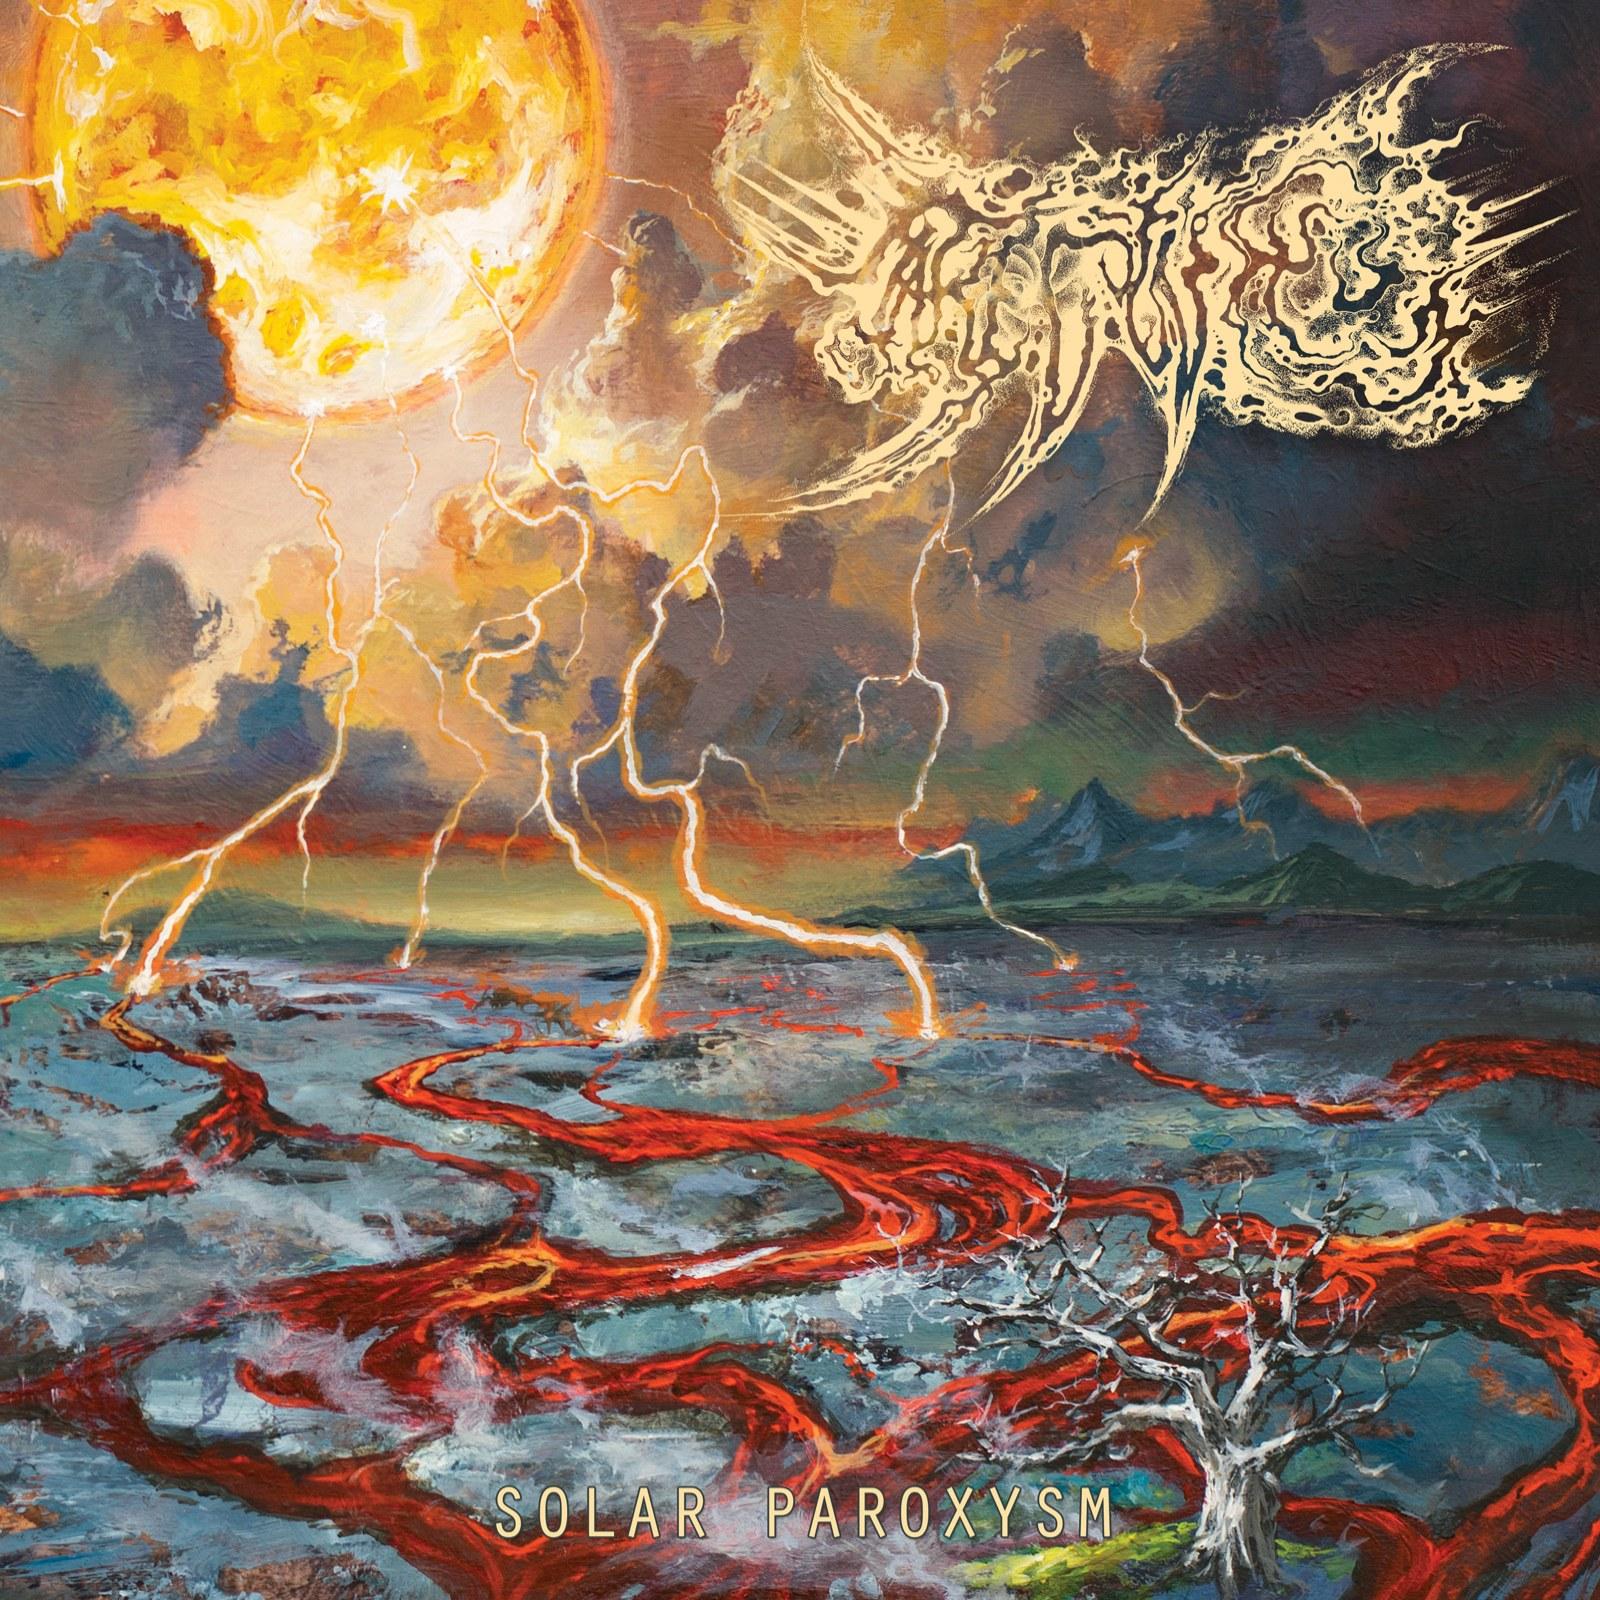 Reviews for Mare Cognitum - Solar Paroxysm